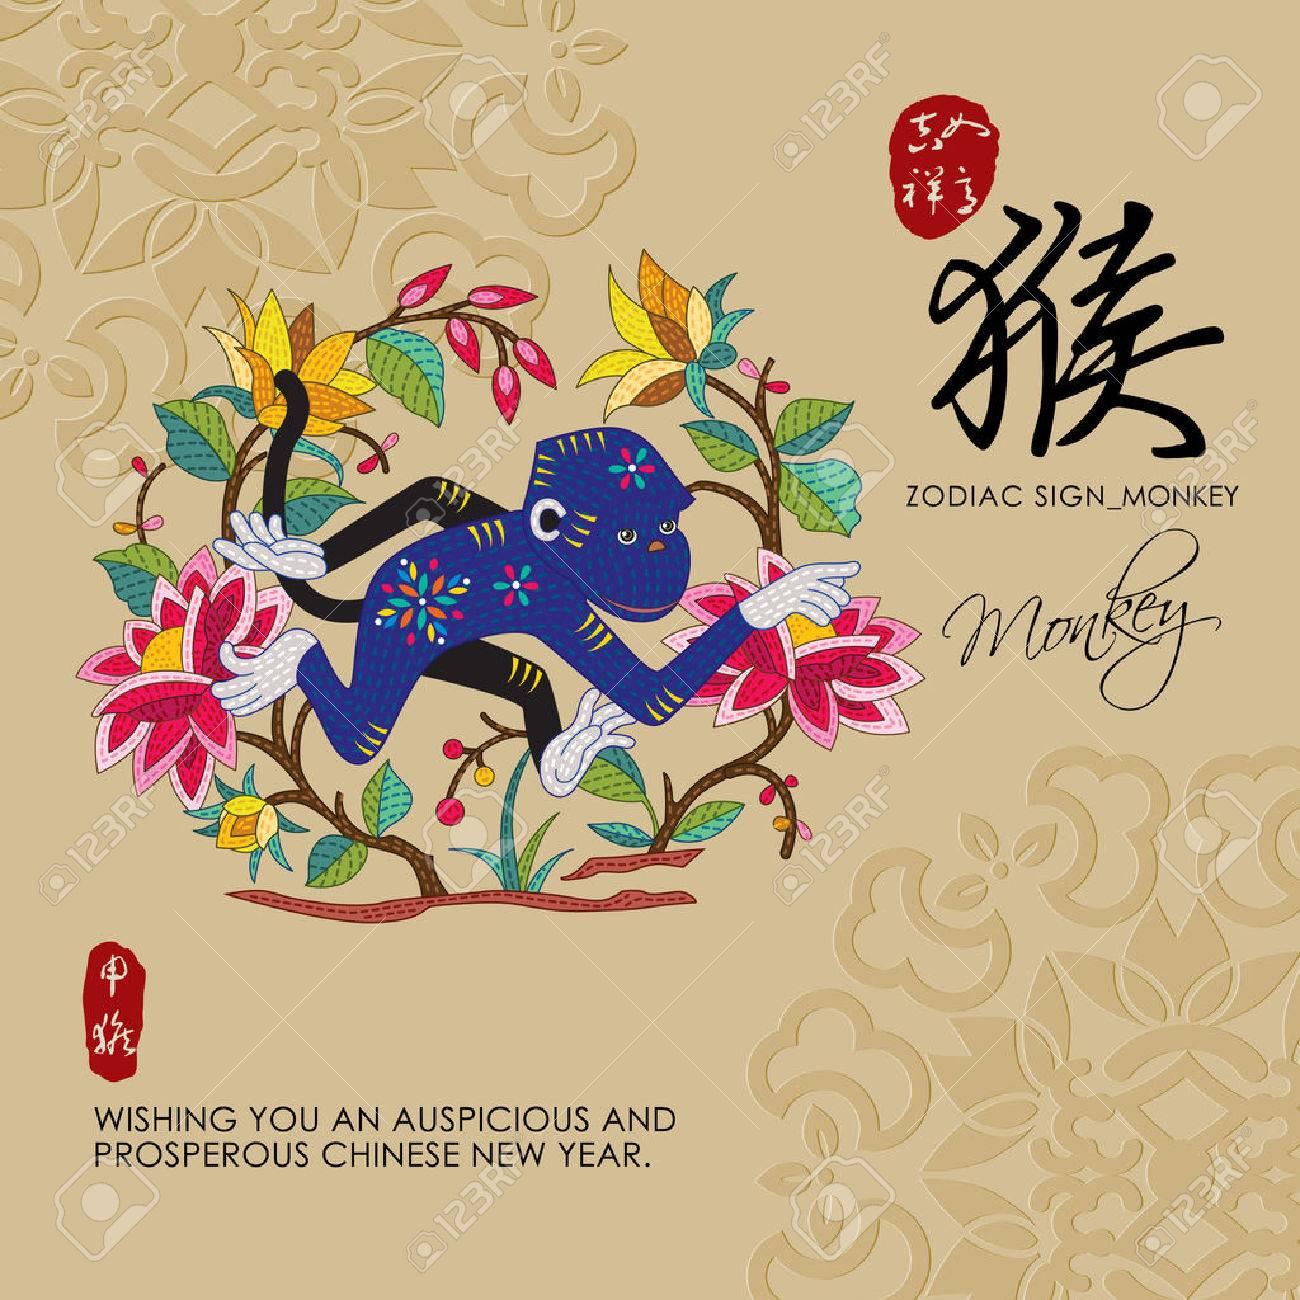 12 китайских знаков зодиака